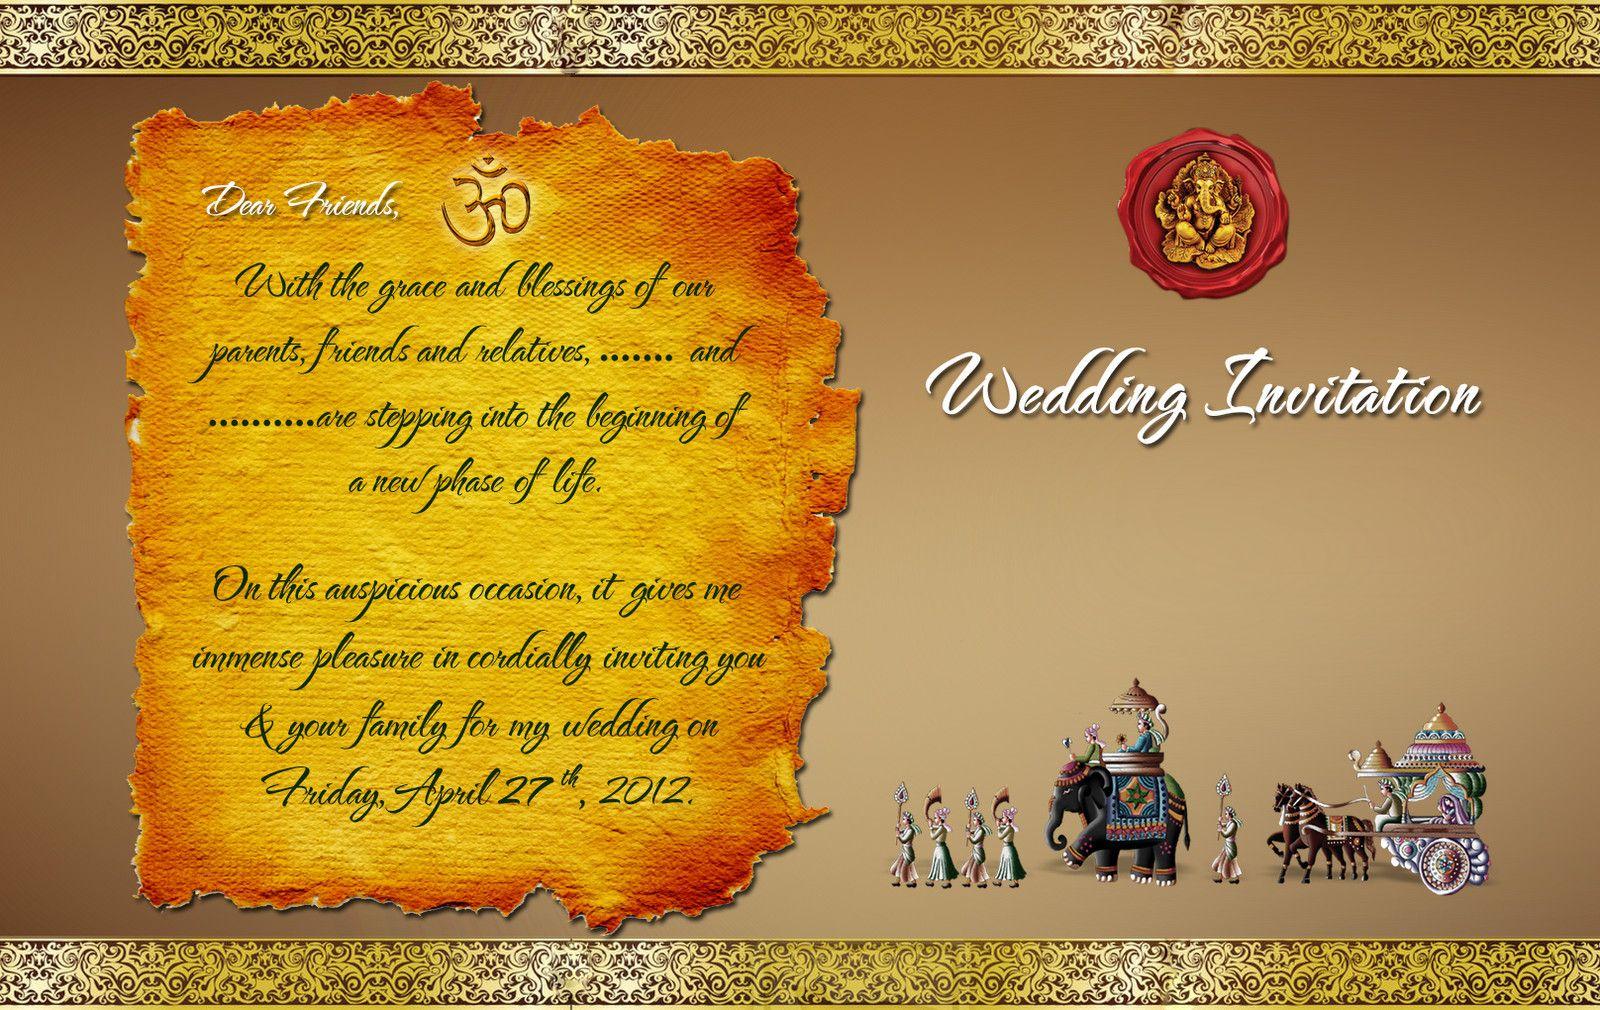 Hindu Wedding Invitation Template Lovely Indian Wedding Card Design Psd Files Free Wedding Hindu Wedding Cards Indian Wedding Cards Free Wedding Cards